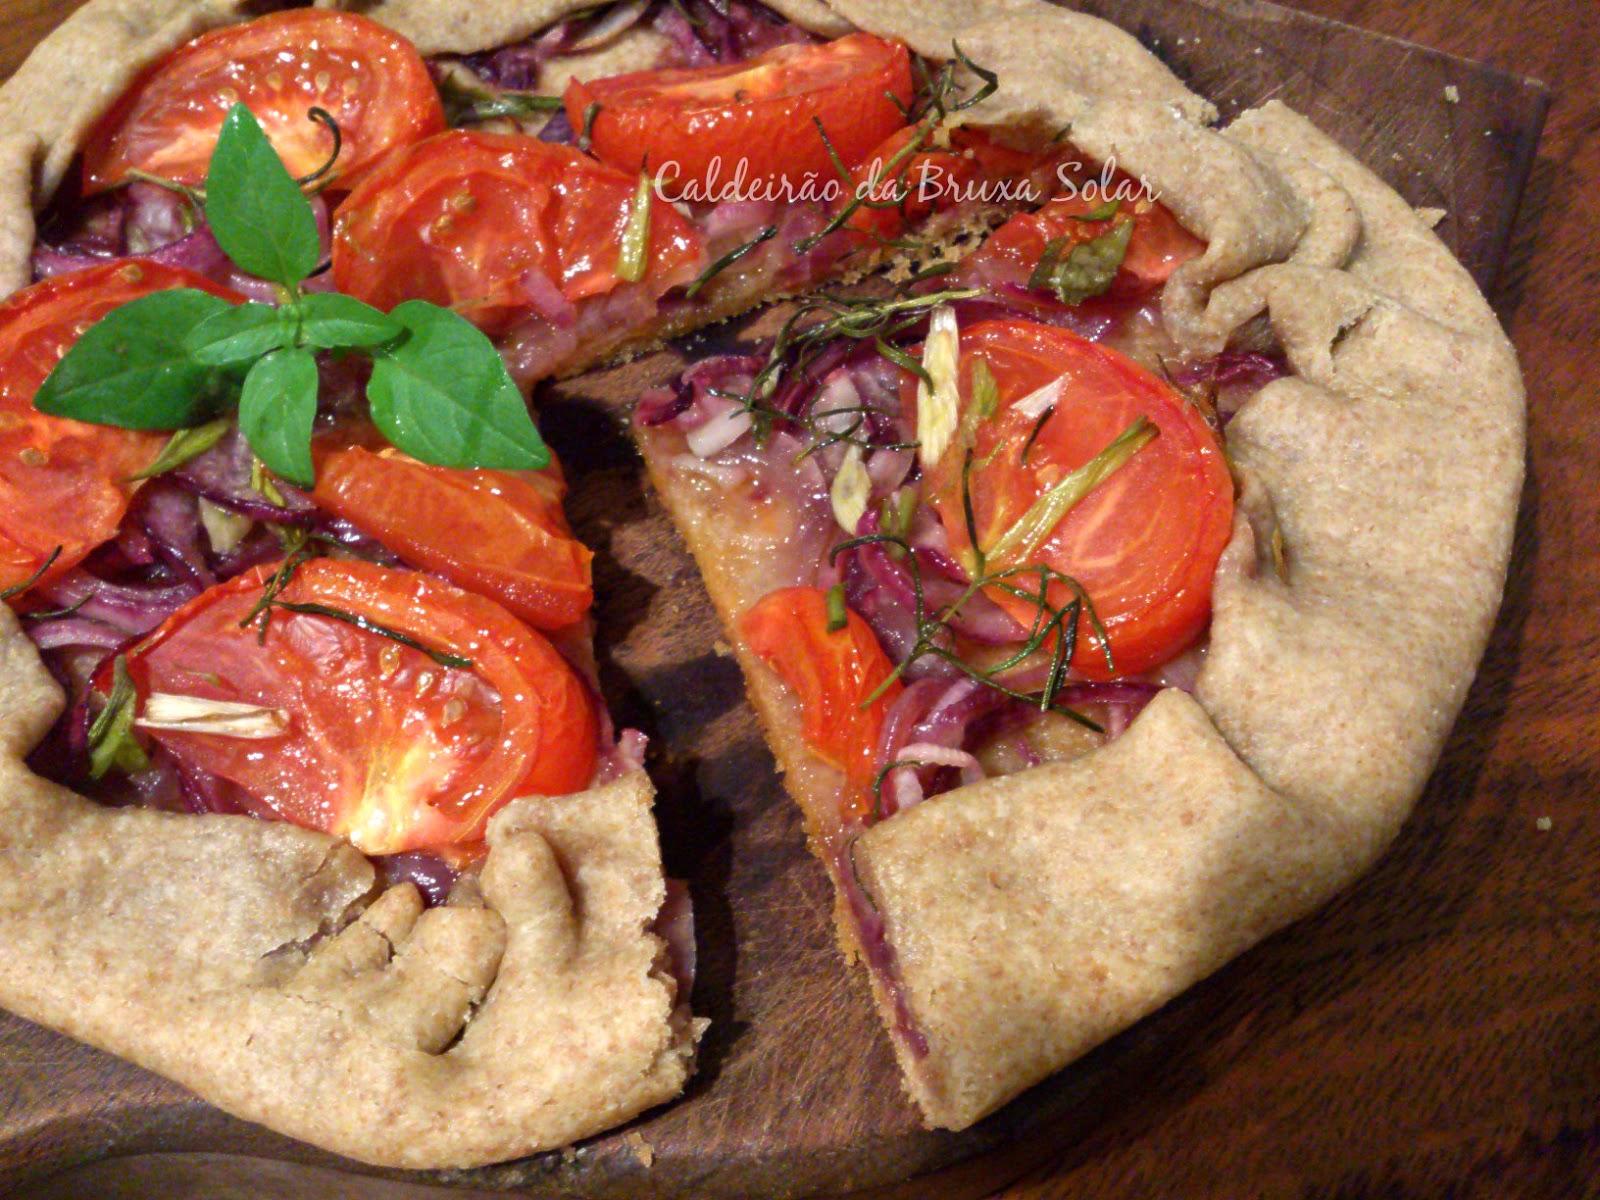 Torta rústica integral de cebolas, tomates e ervas